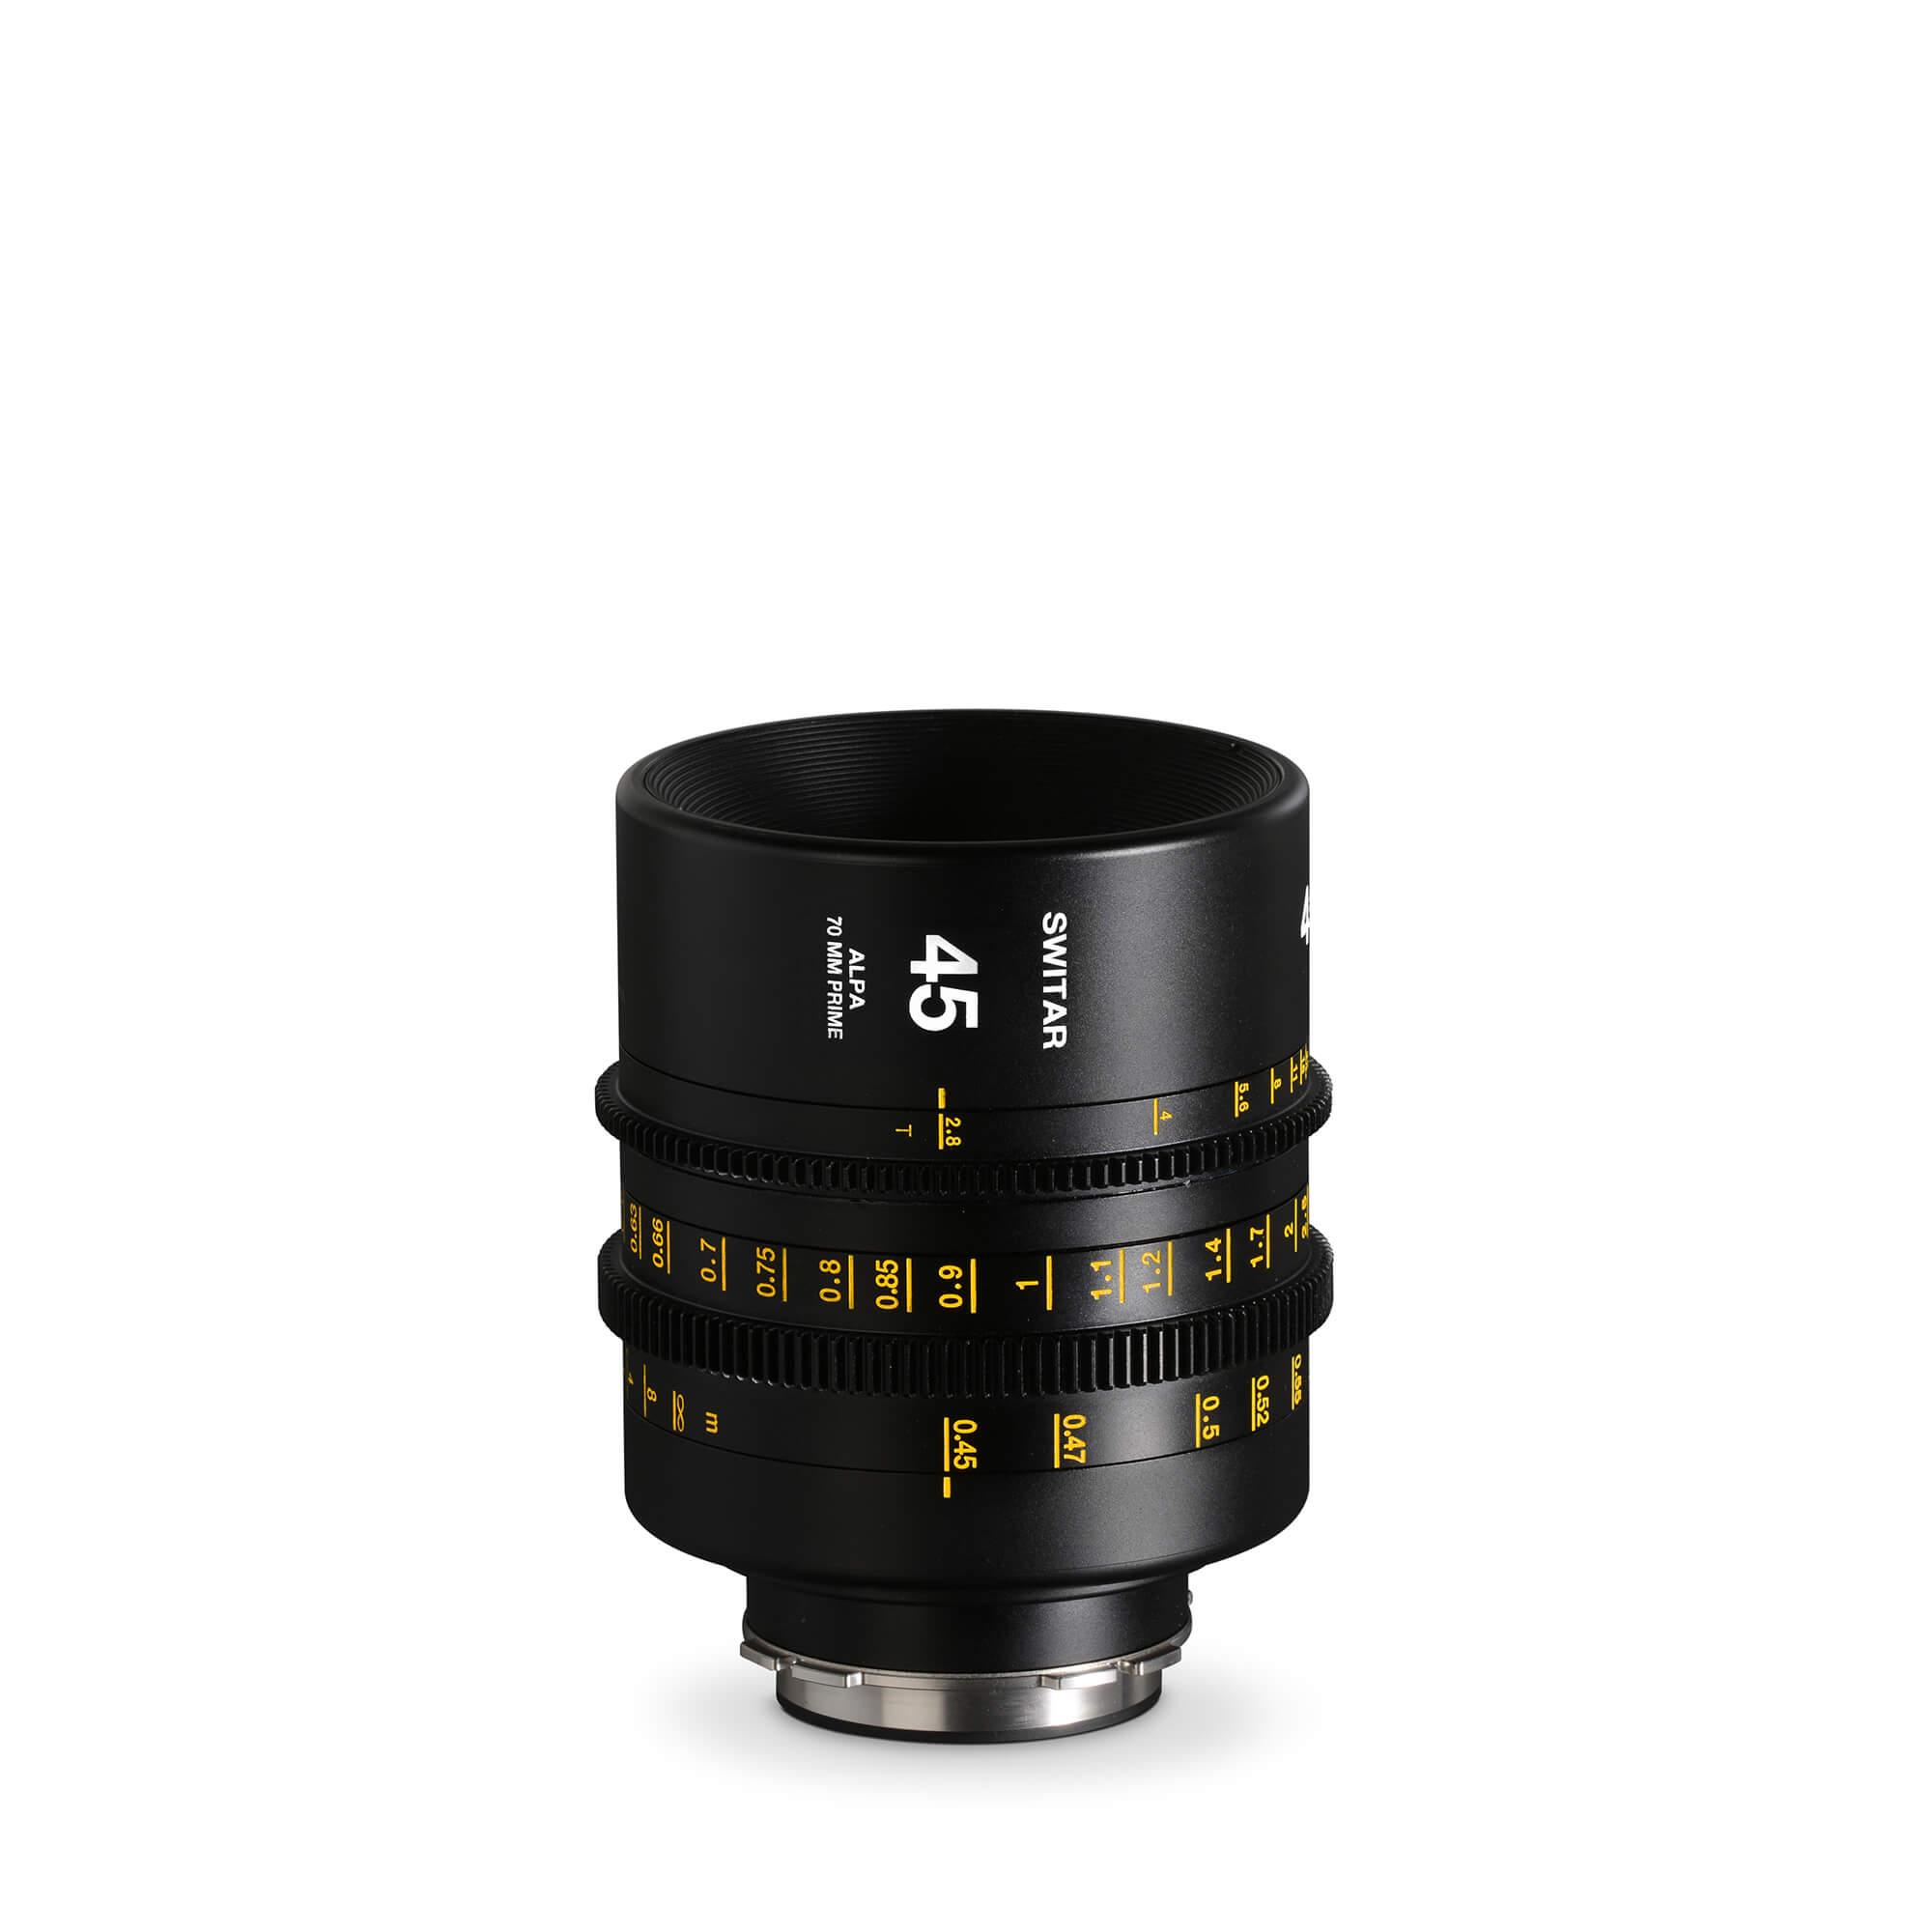 ALPA Switar 2.8/45 mm Cine Prime IC 70 mm - feet